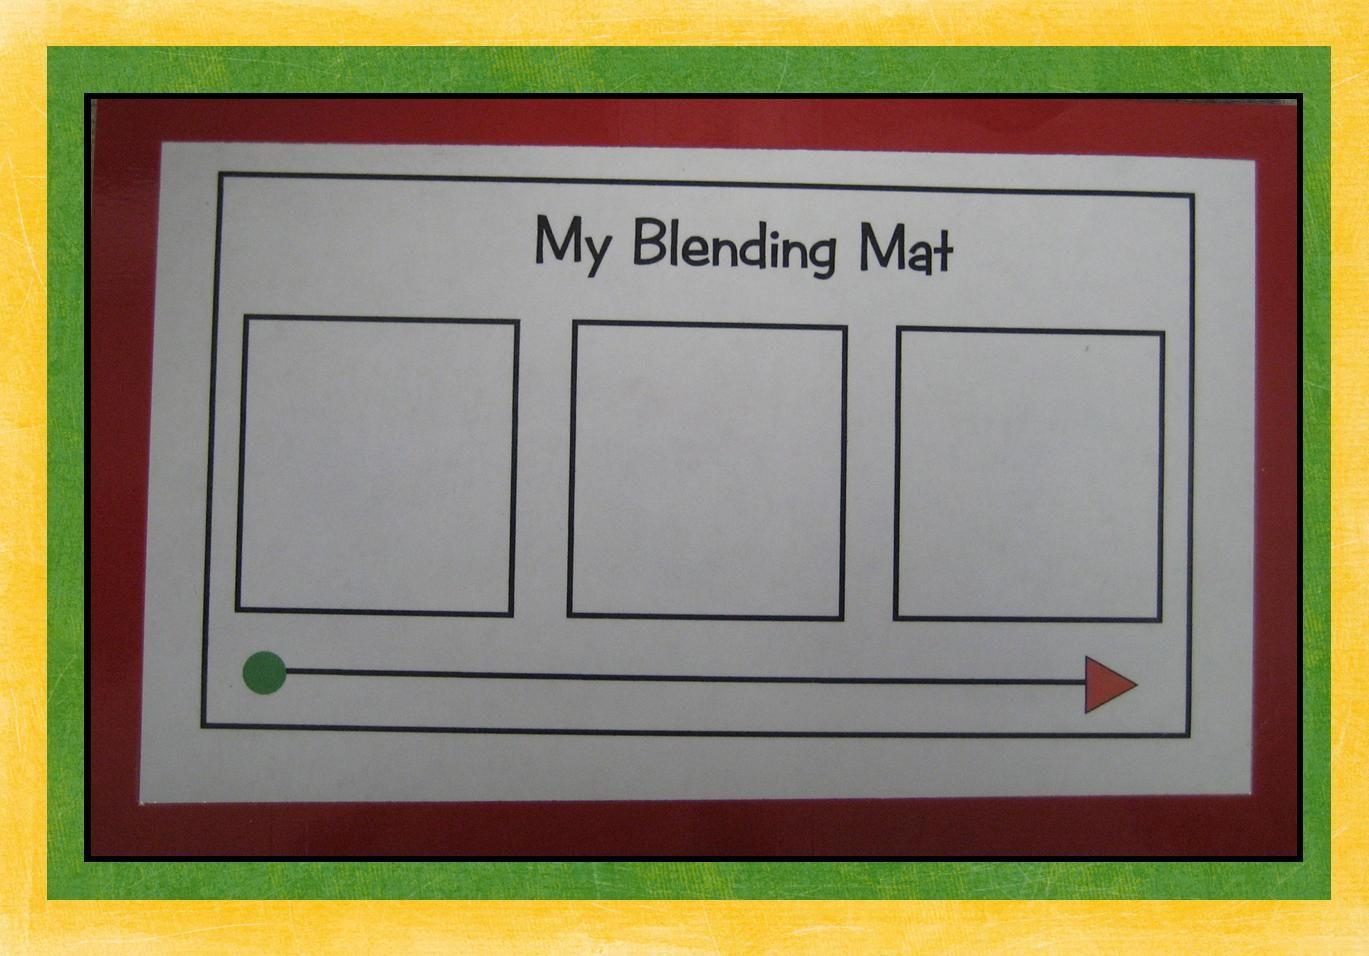 Kindergarten Crayons Phonics Blending Mat Meant To Be